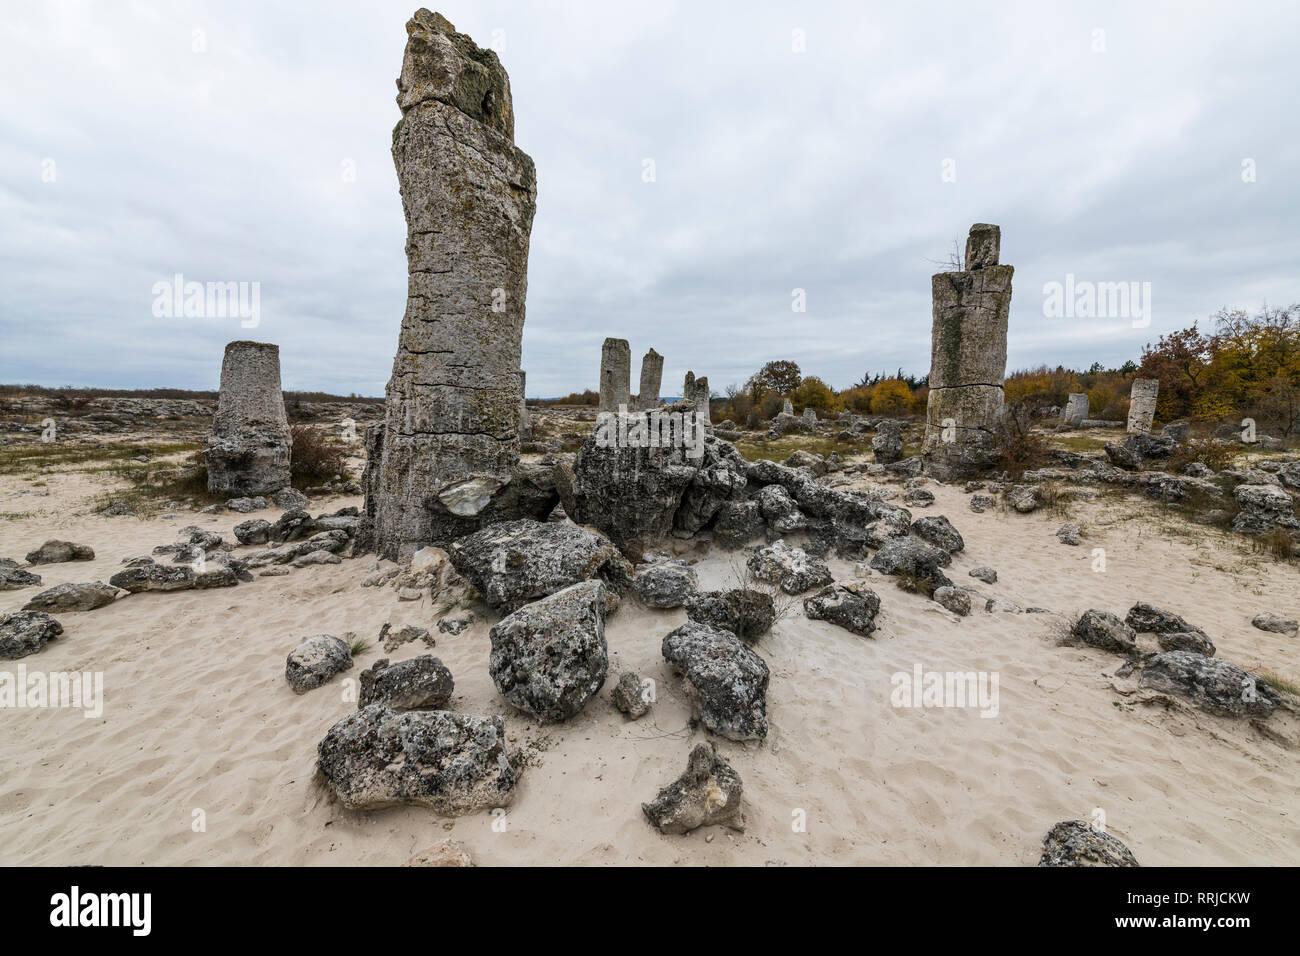 Stone desert Pobiti Kamani rock phenomenon, near Varna, Bulgaria, Europe - Stock Image